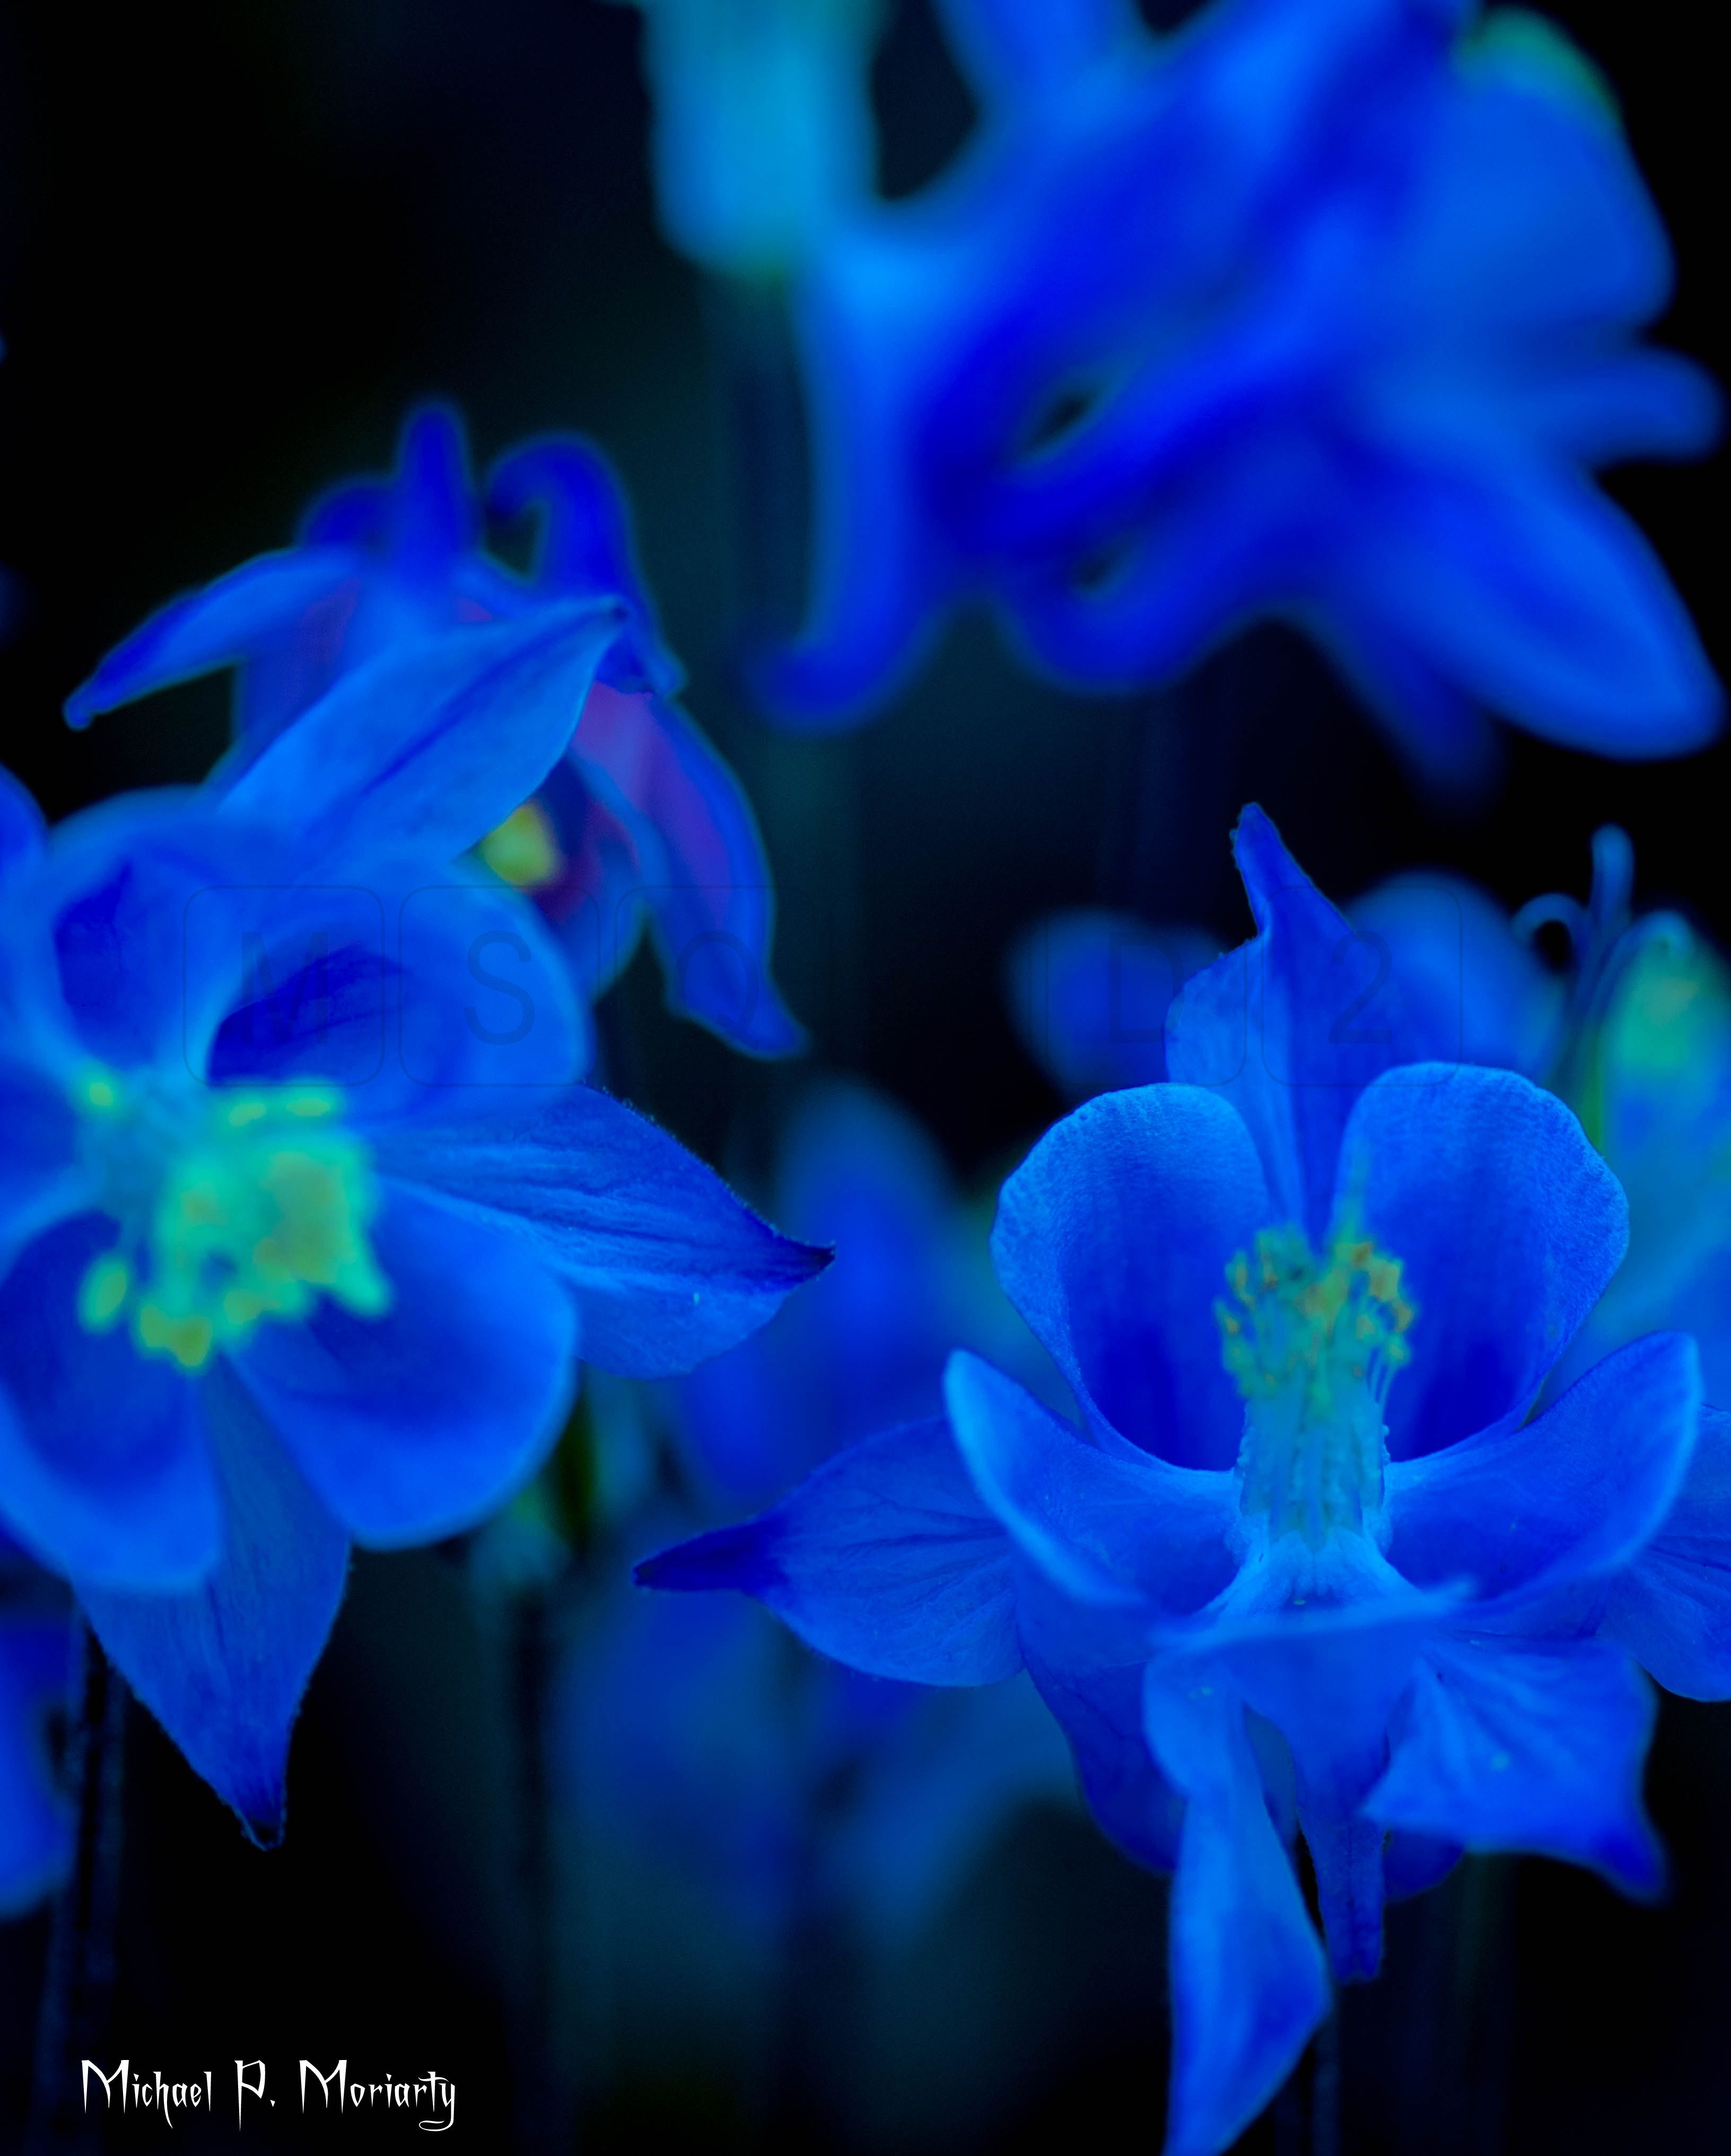 Midnight neon blue flowers photo credit michael moriarty midnight neon blue flowers photo credit michael moriarty photography izmirmasajfo